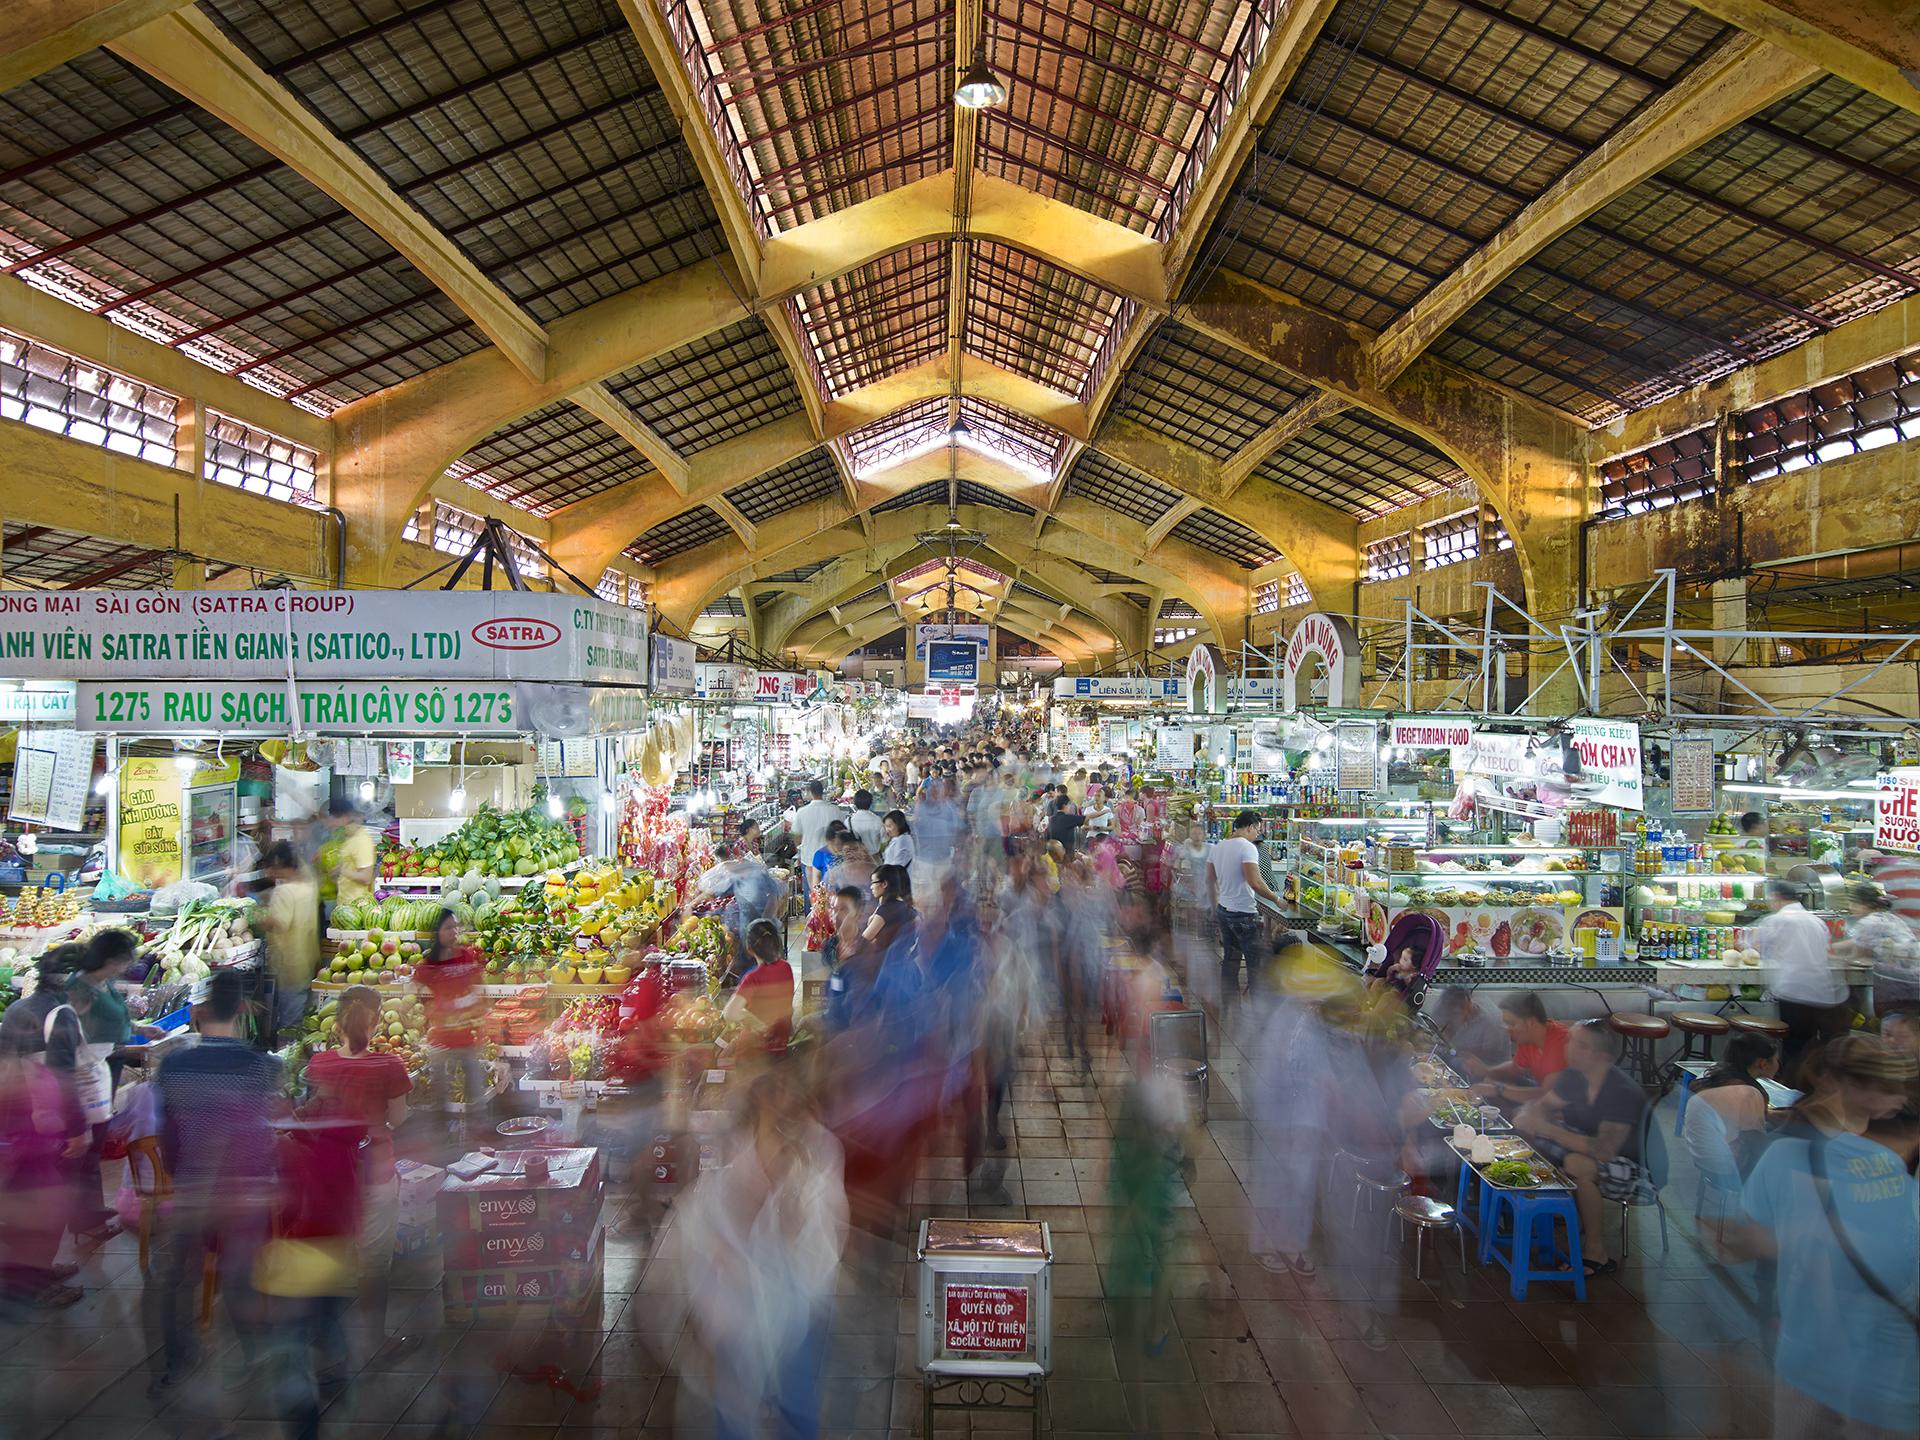 Ben Thanh Market, North Entrance, Saigon, Vietnam - 2013.jpg